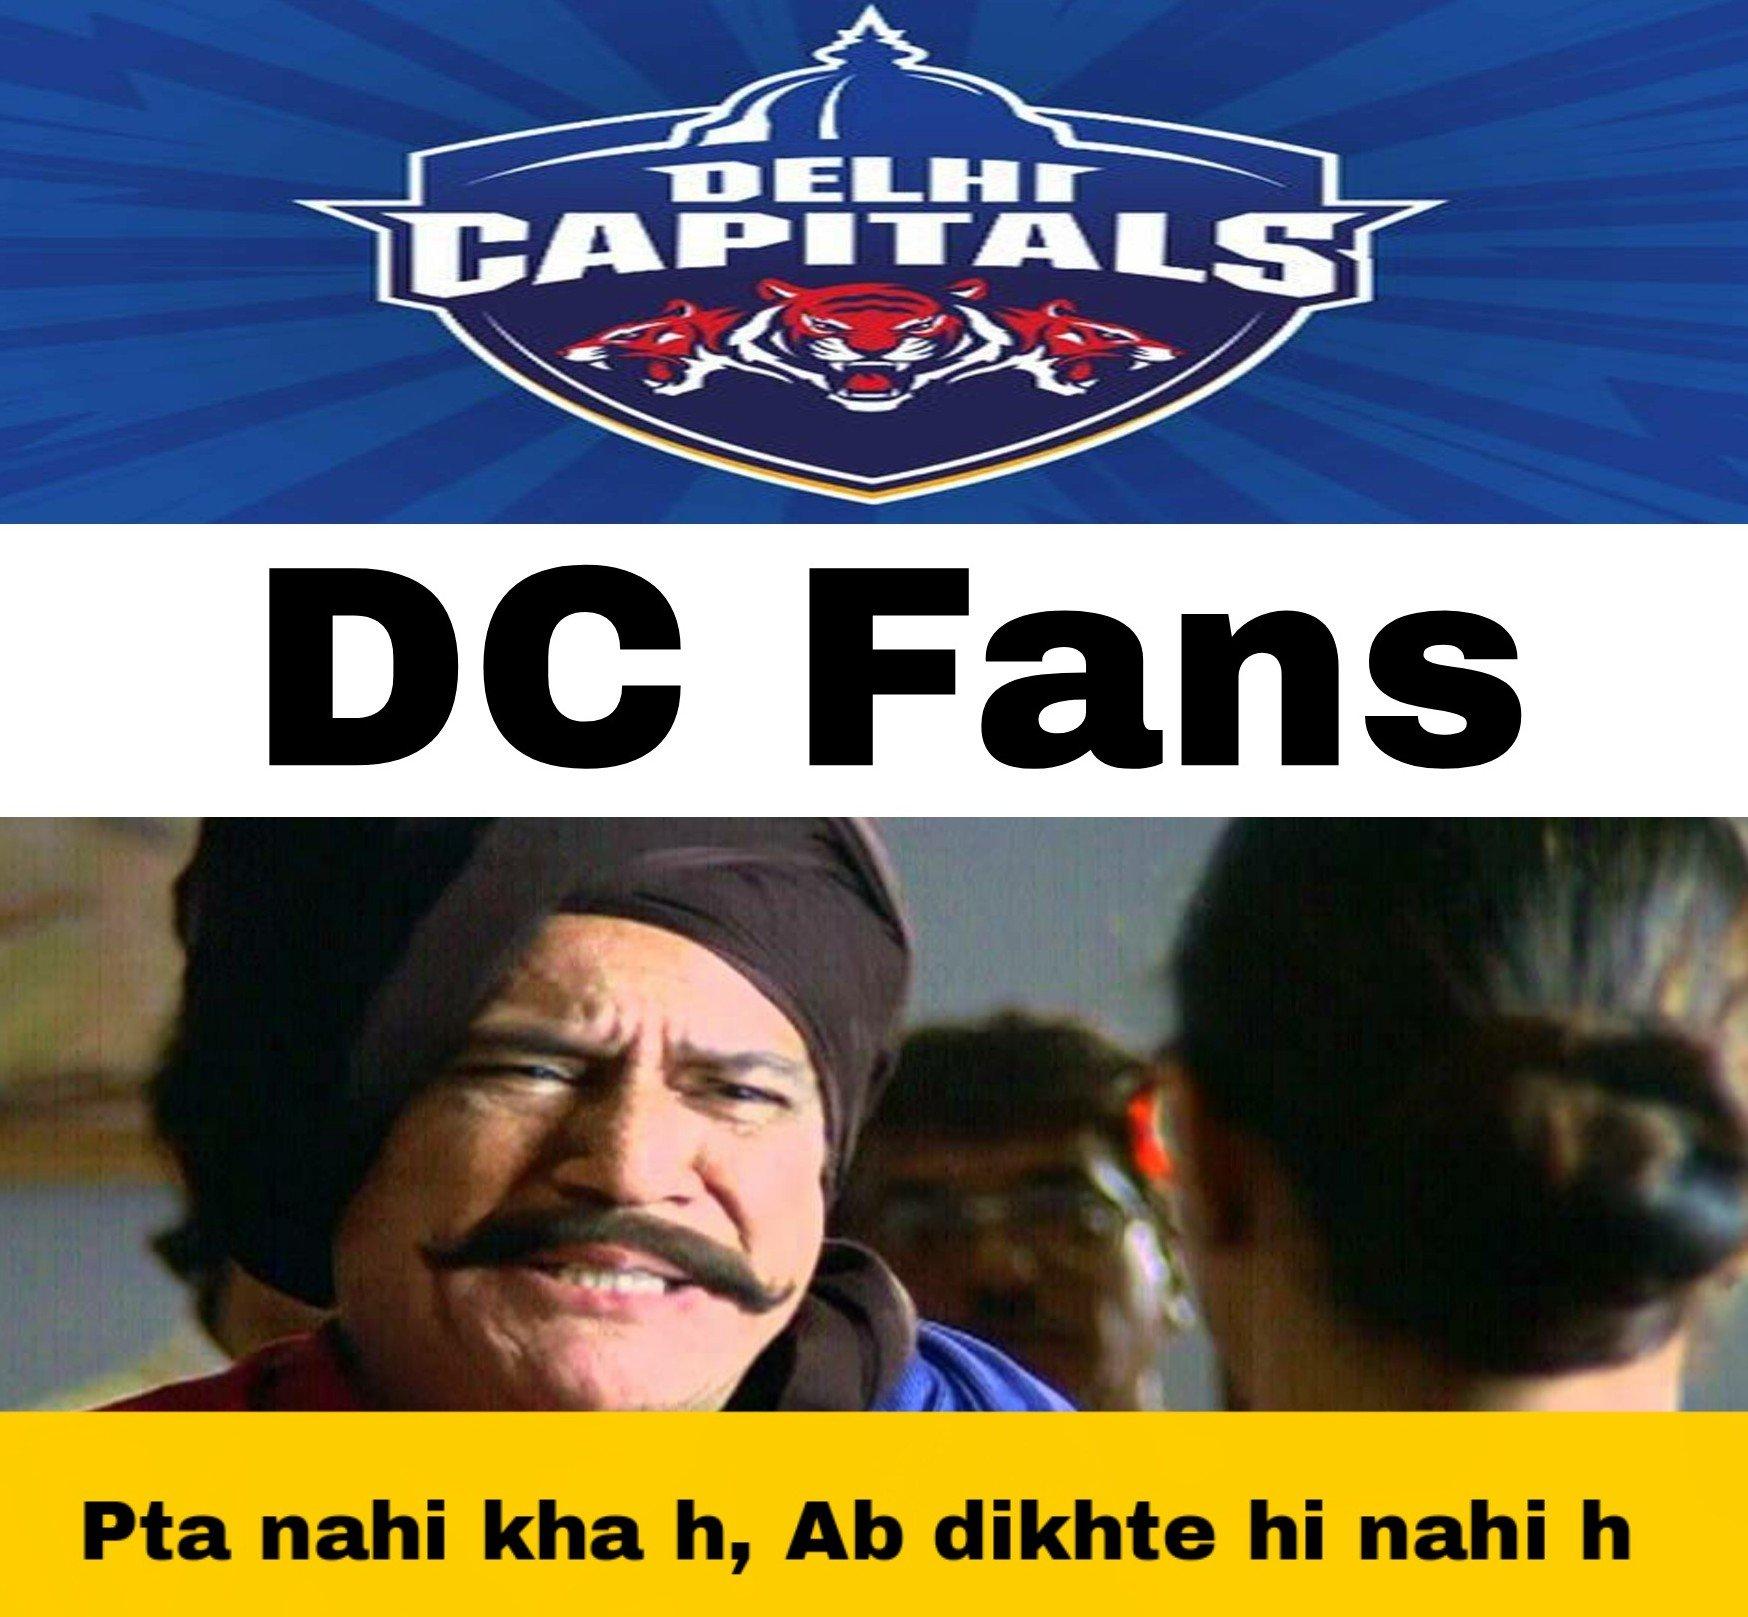 IPL - DC memes